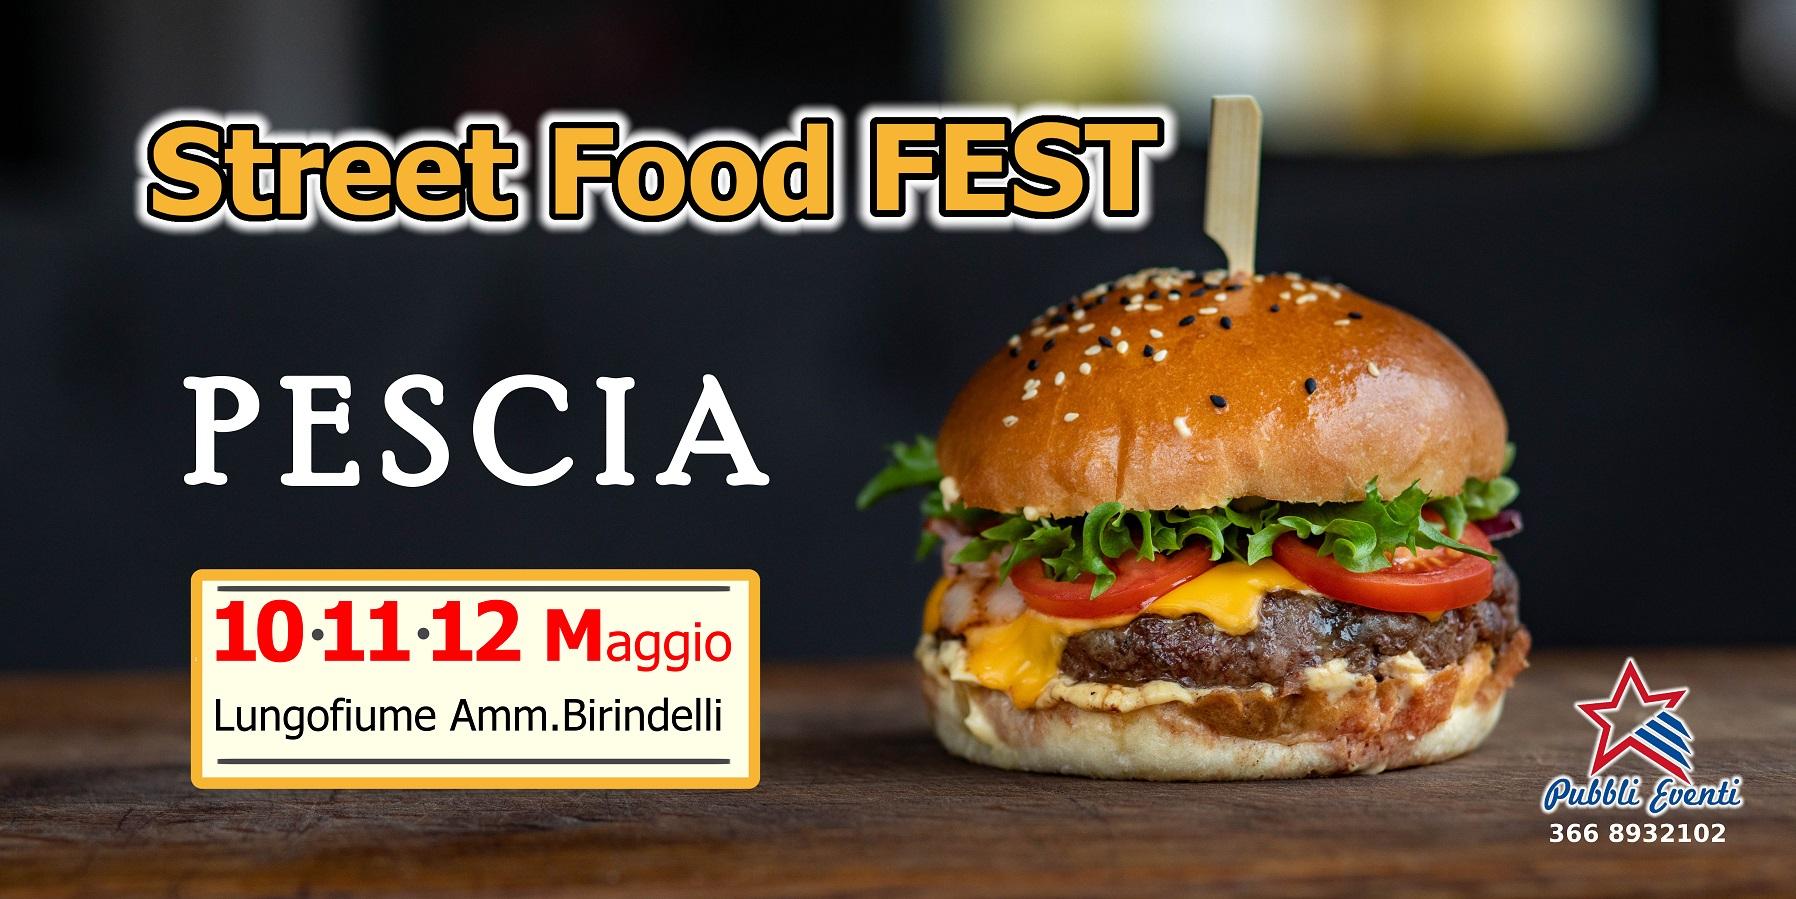 Pescia - Street Food FEST